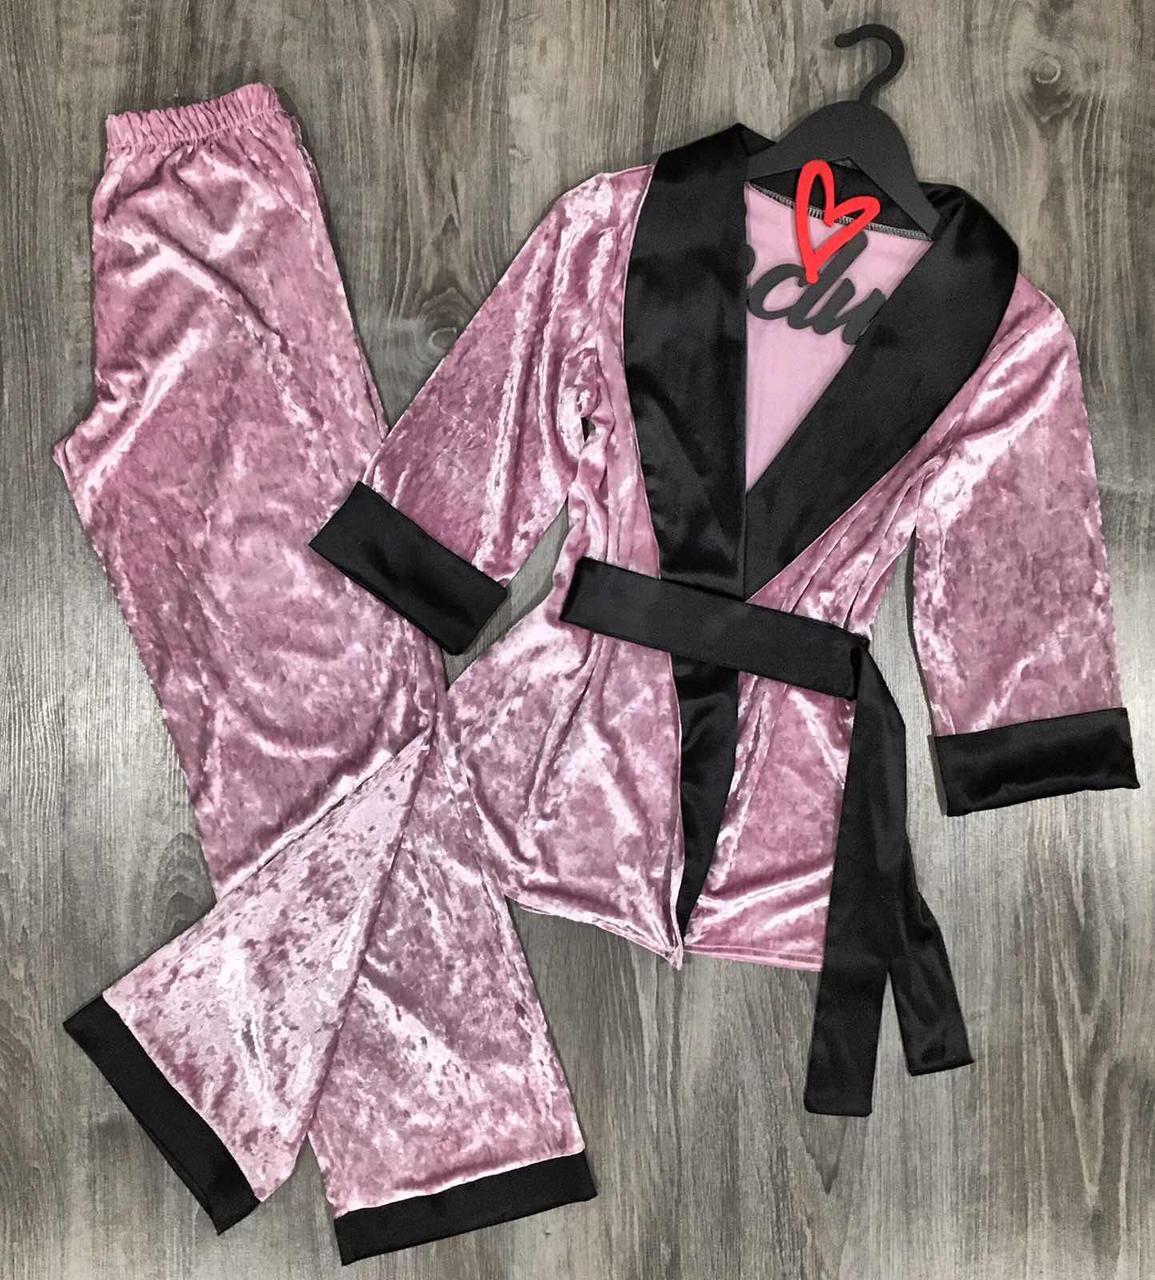 Пижама пиджак и штаны из мраморного велюра 046-1 пинк.